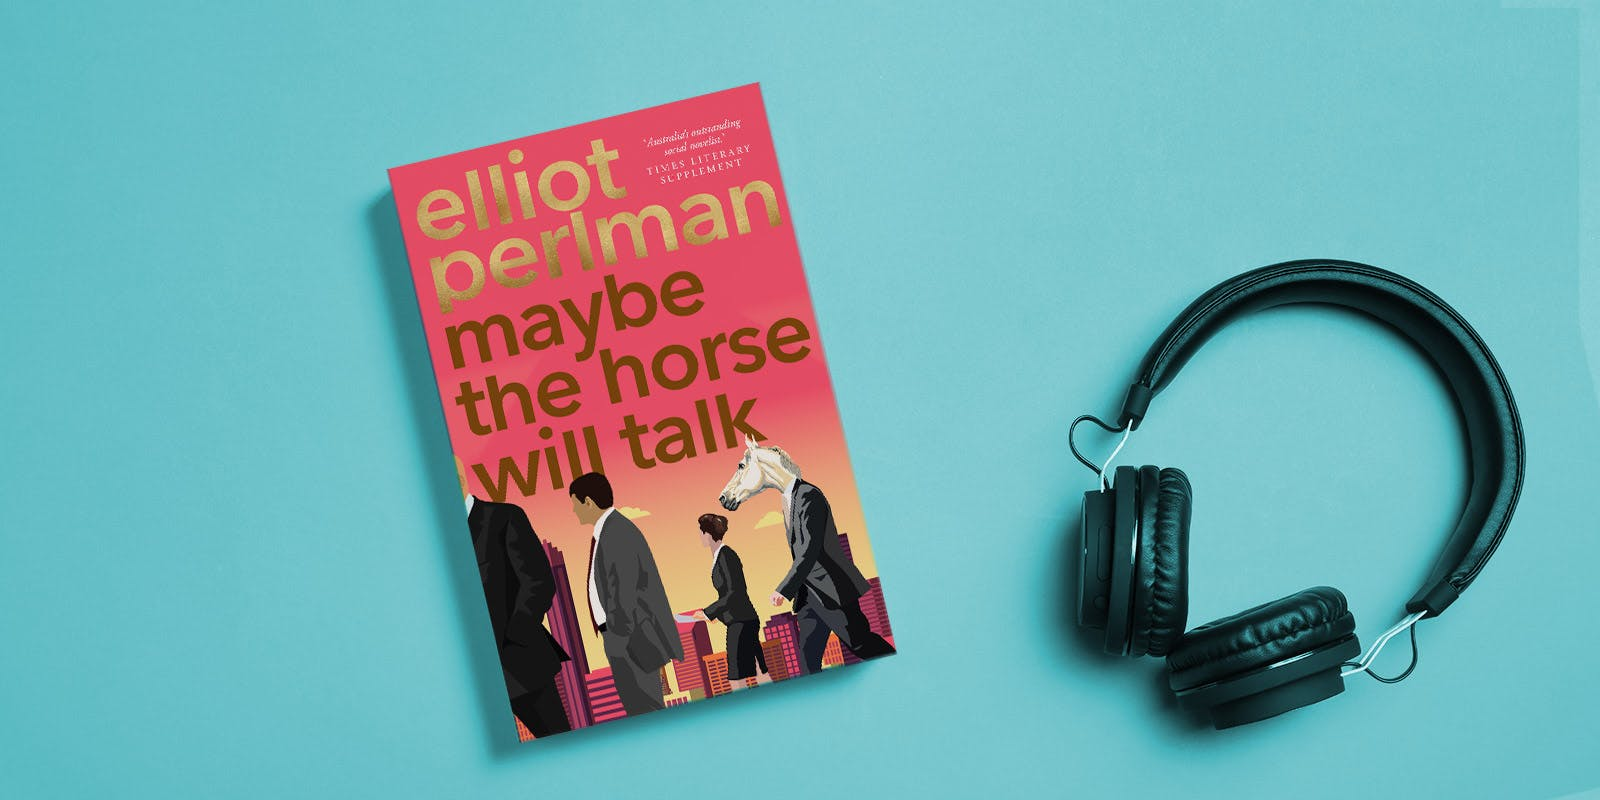 Elliot Perlman Q&A